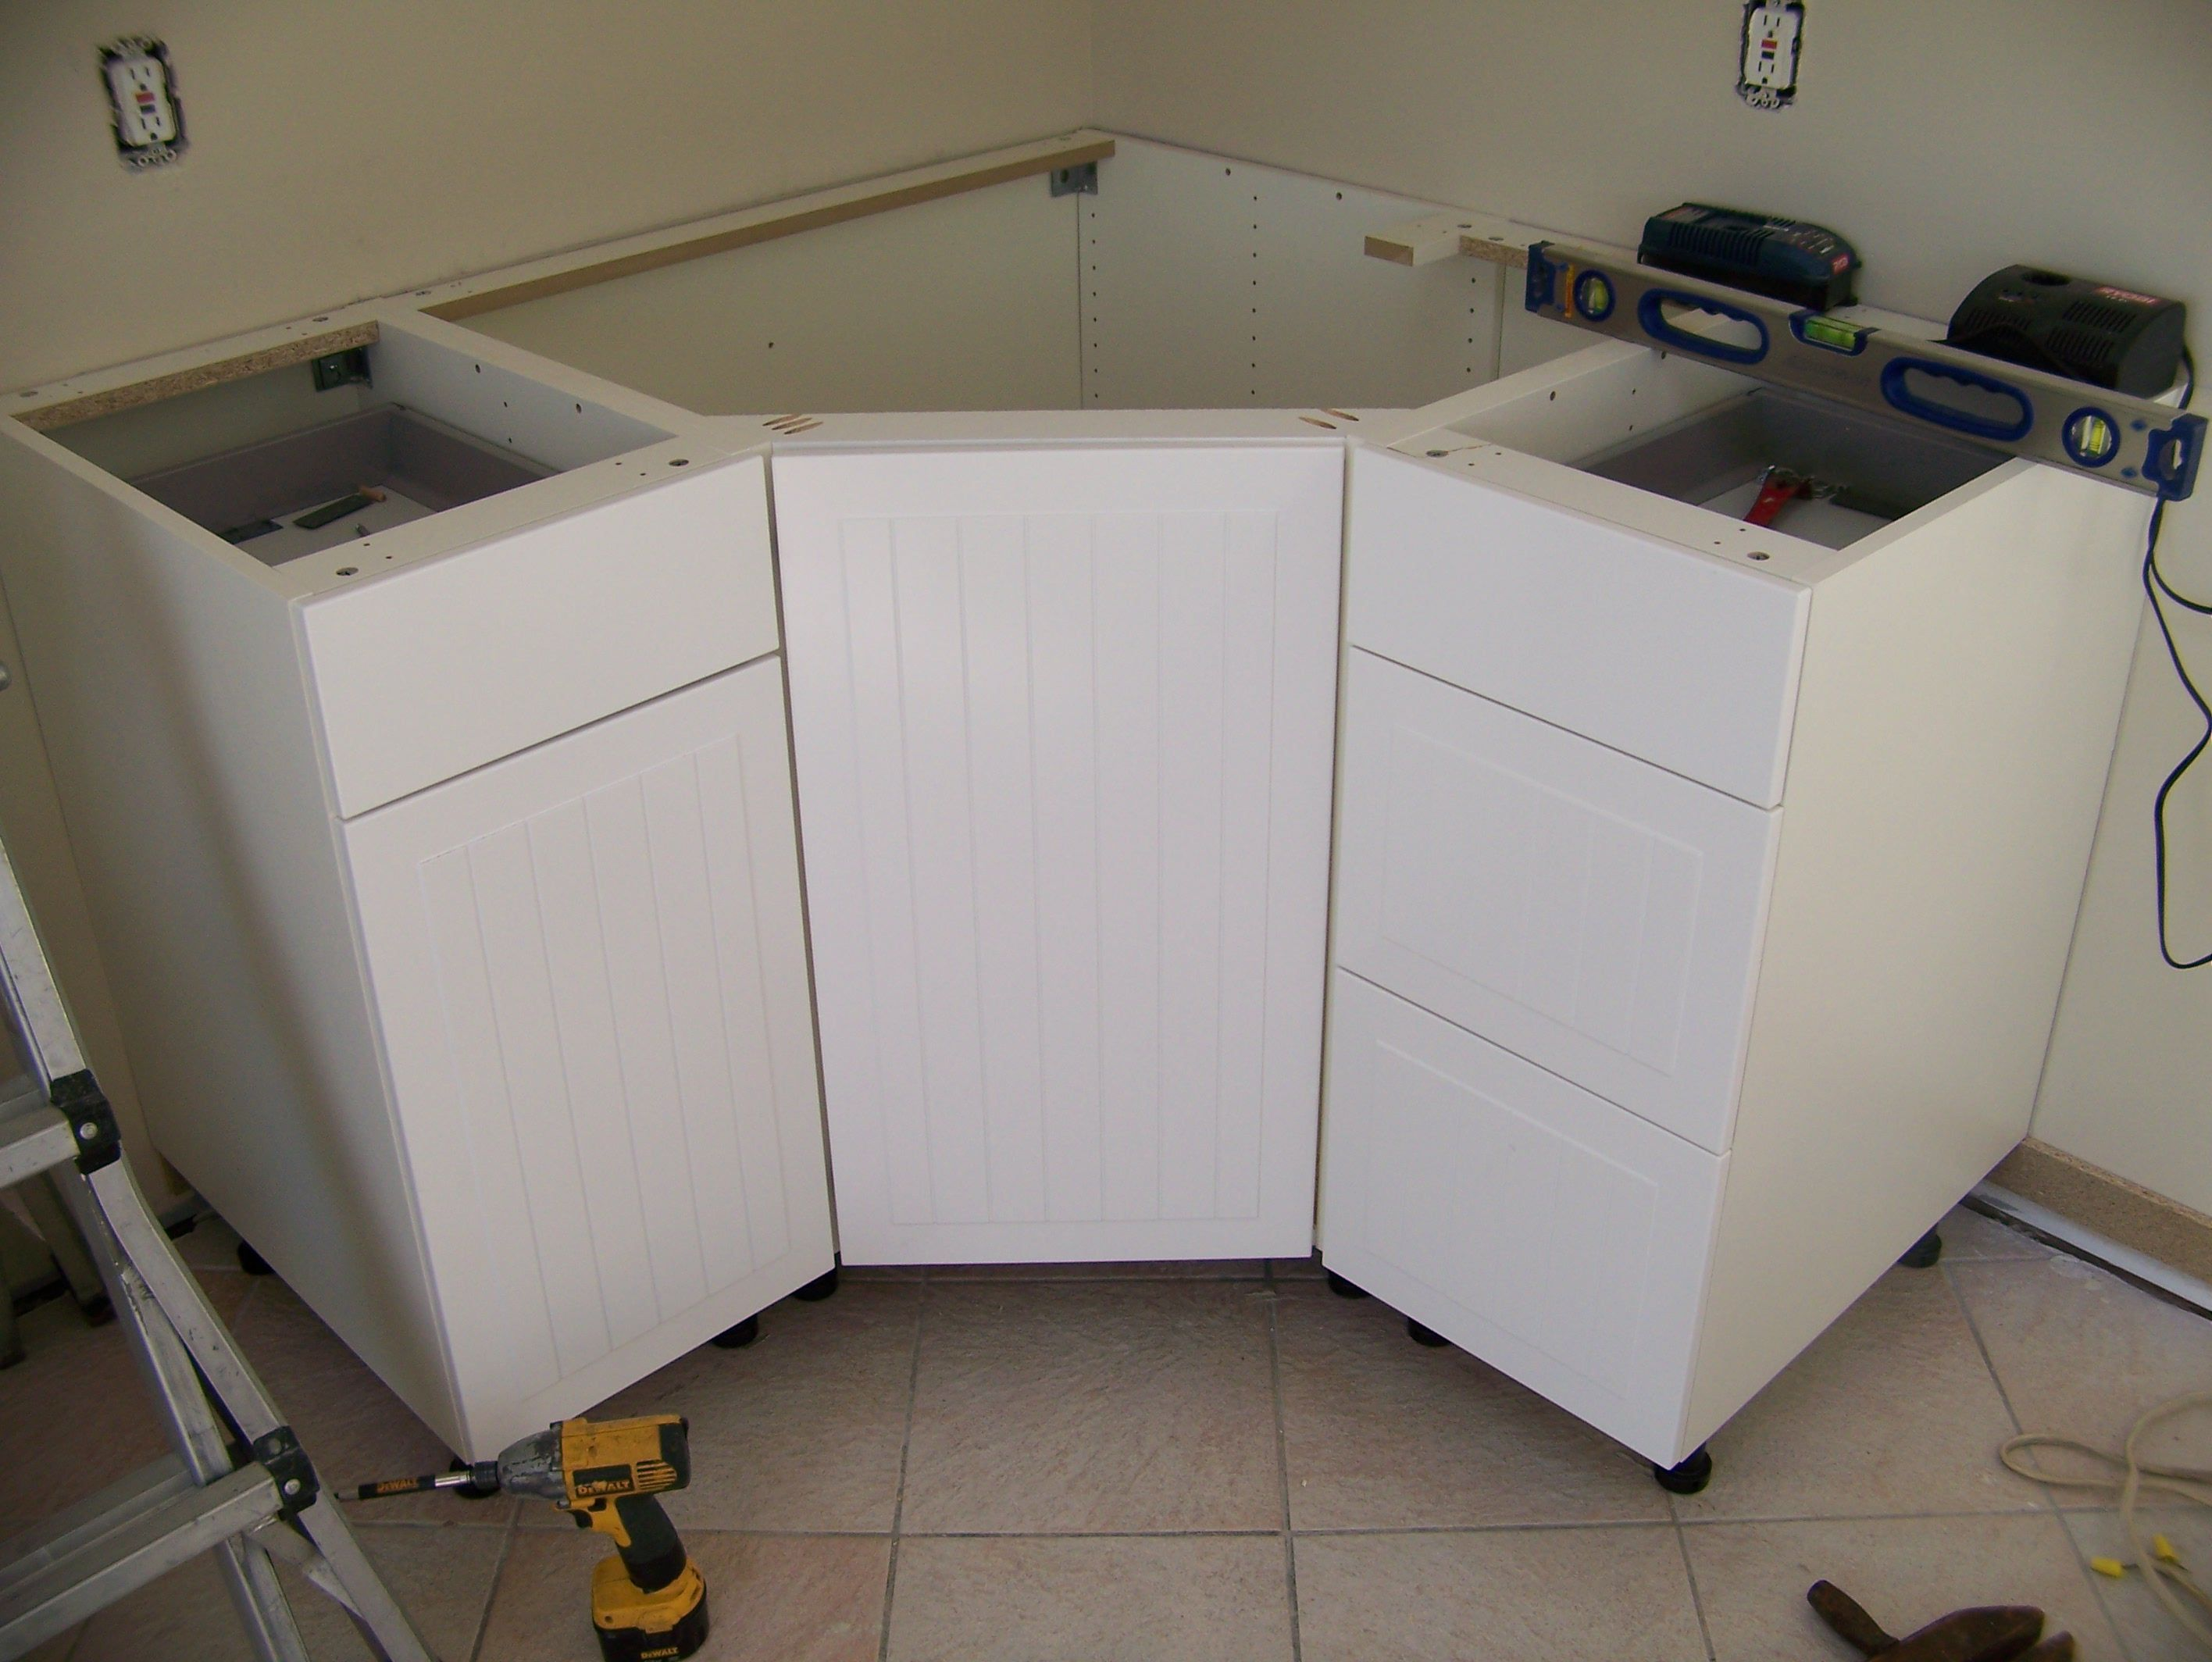 Ikea Corner Sink Base Unterschrank küche, Ikea